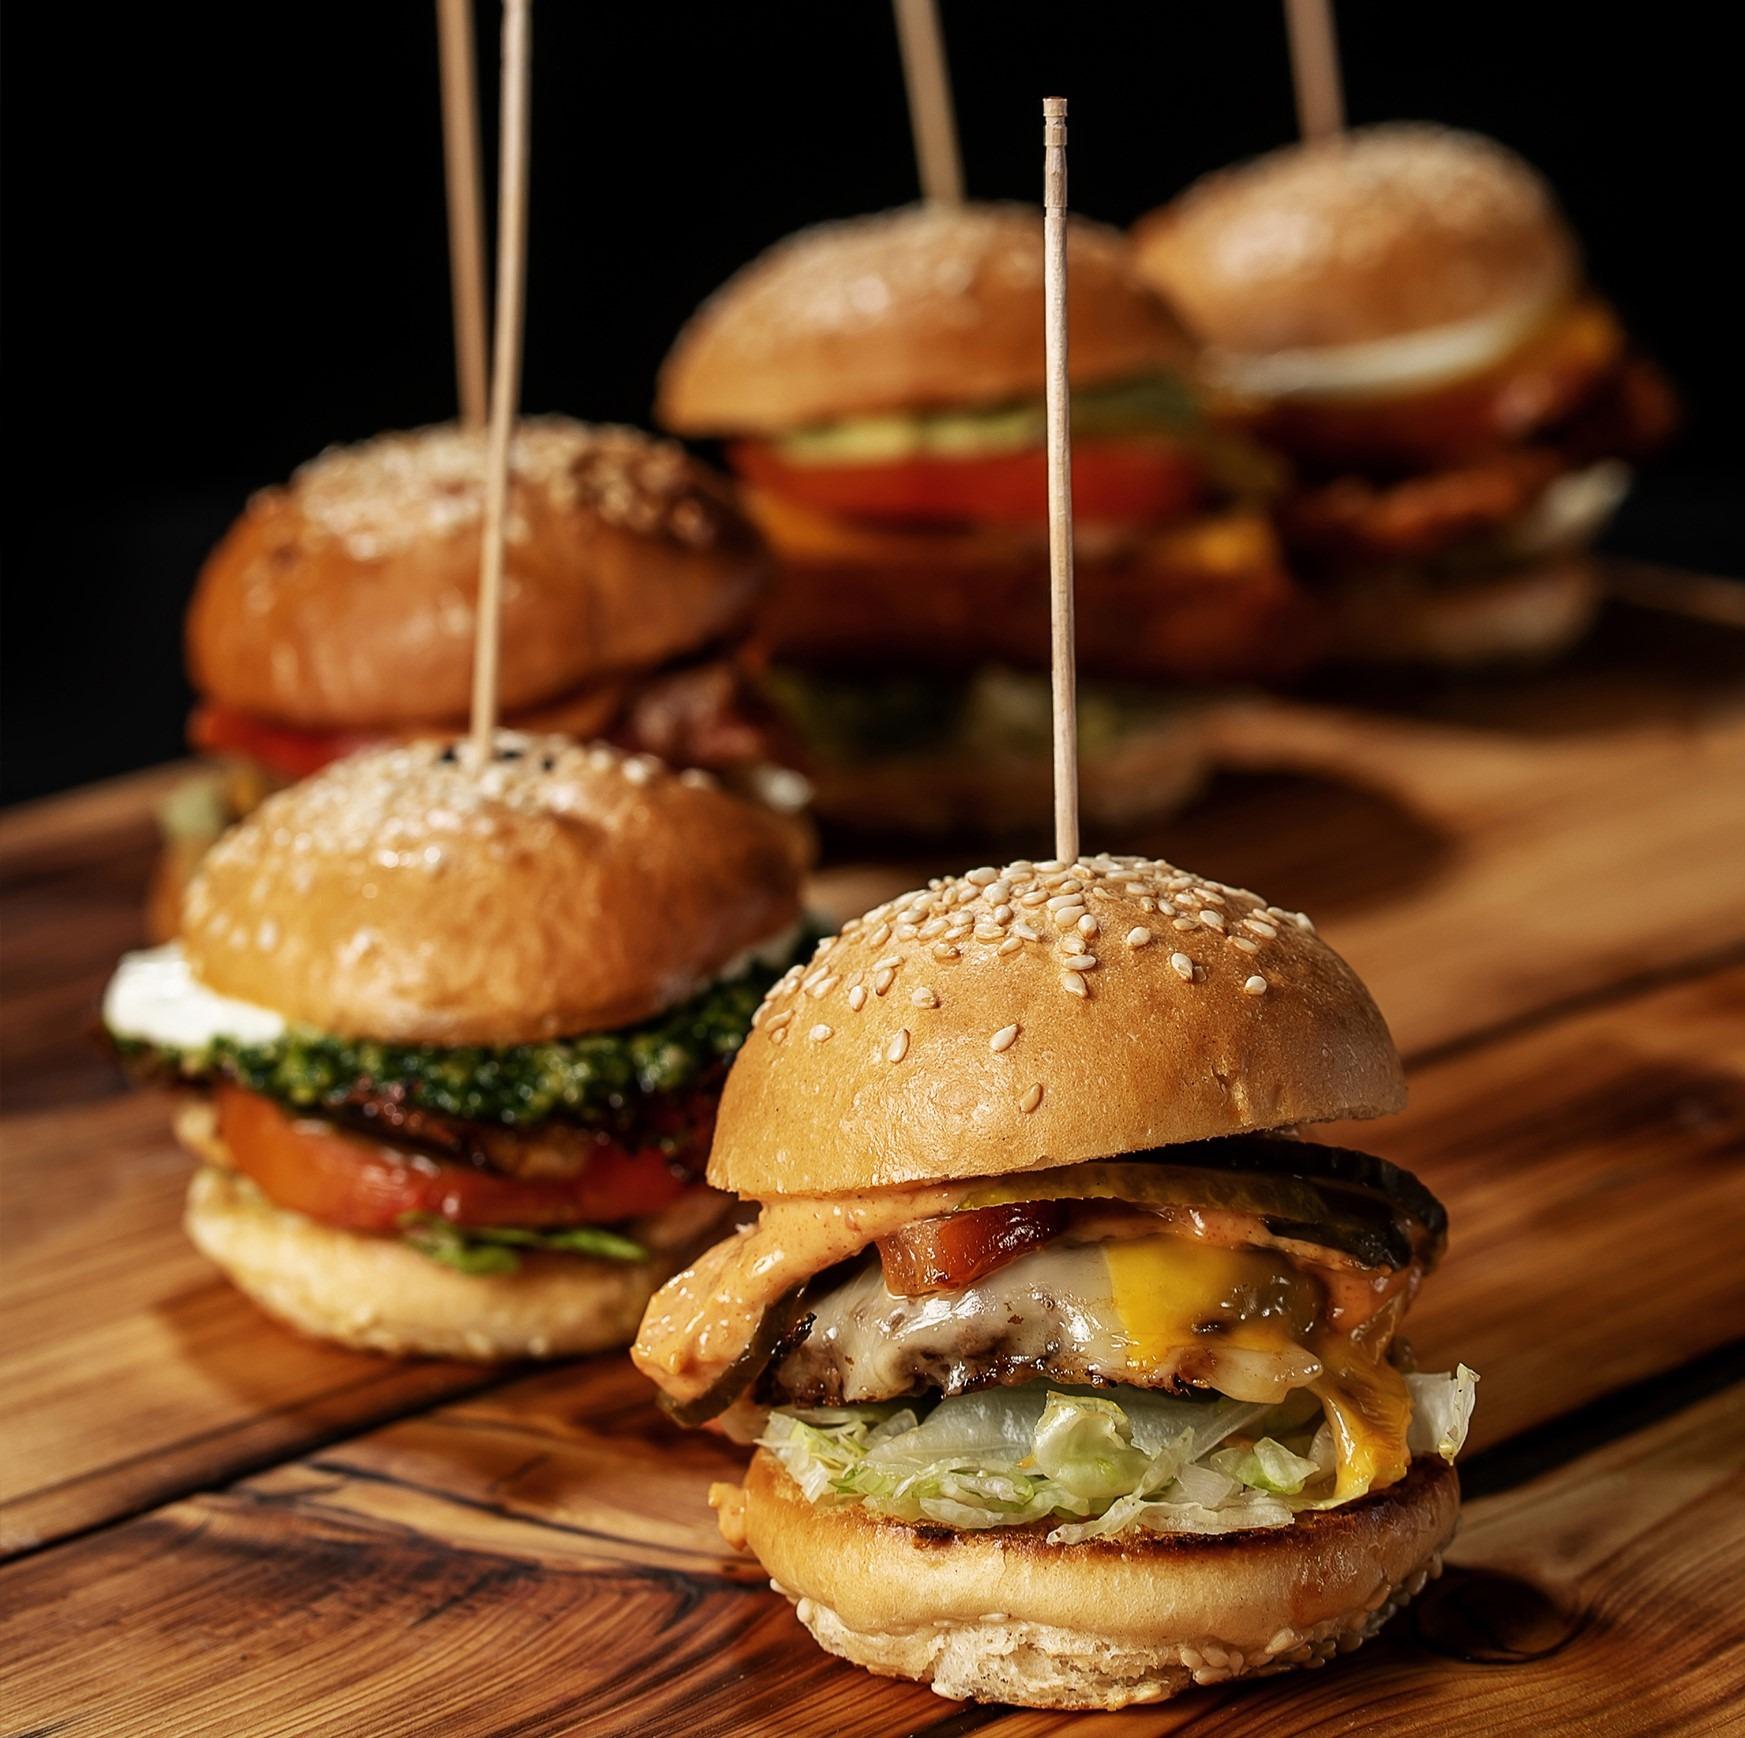 Burgerglück Food-Truck Catering Hamurger